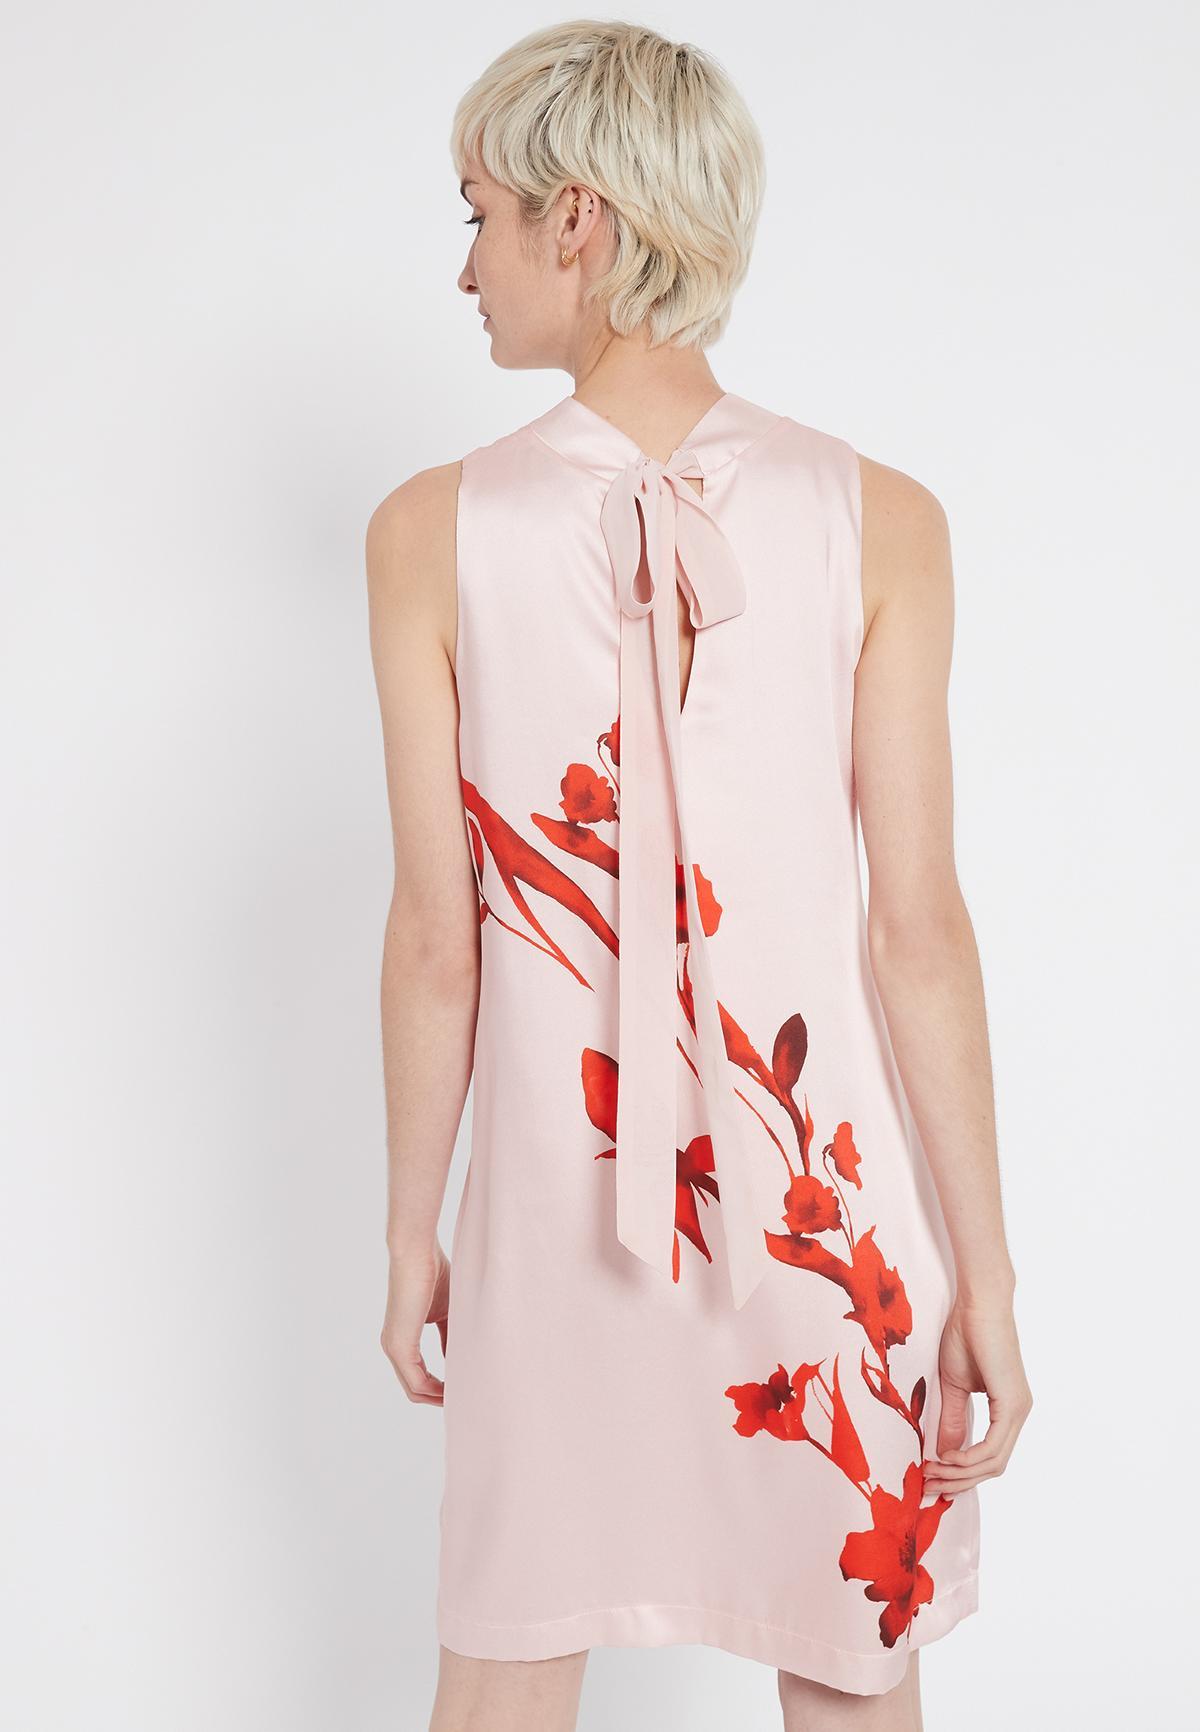 Rear view of Ana Alcazar A-Shaped Dress Senty  worn by model